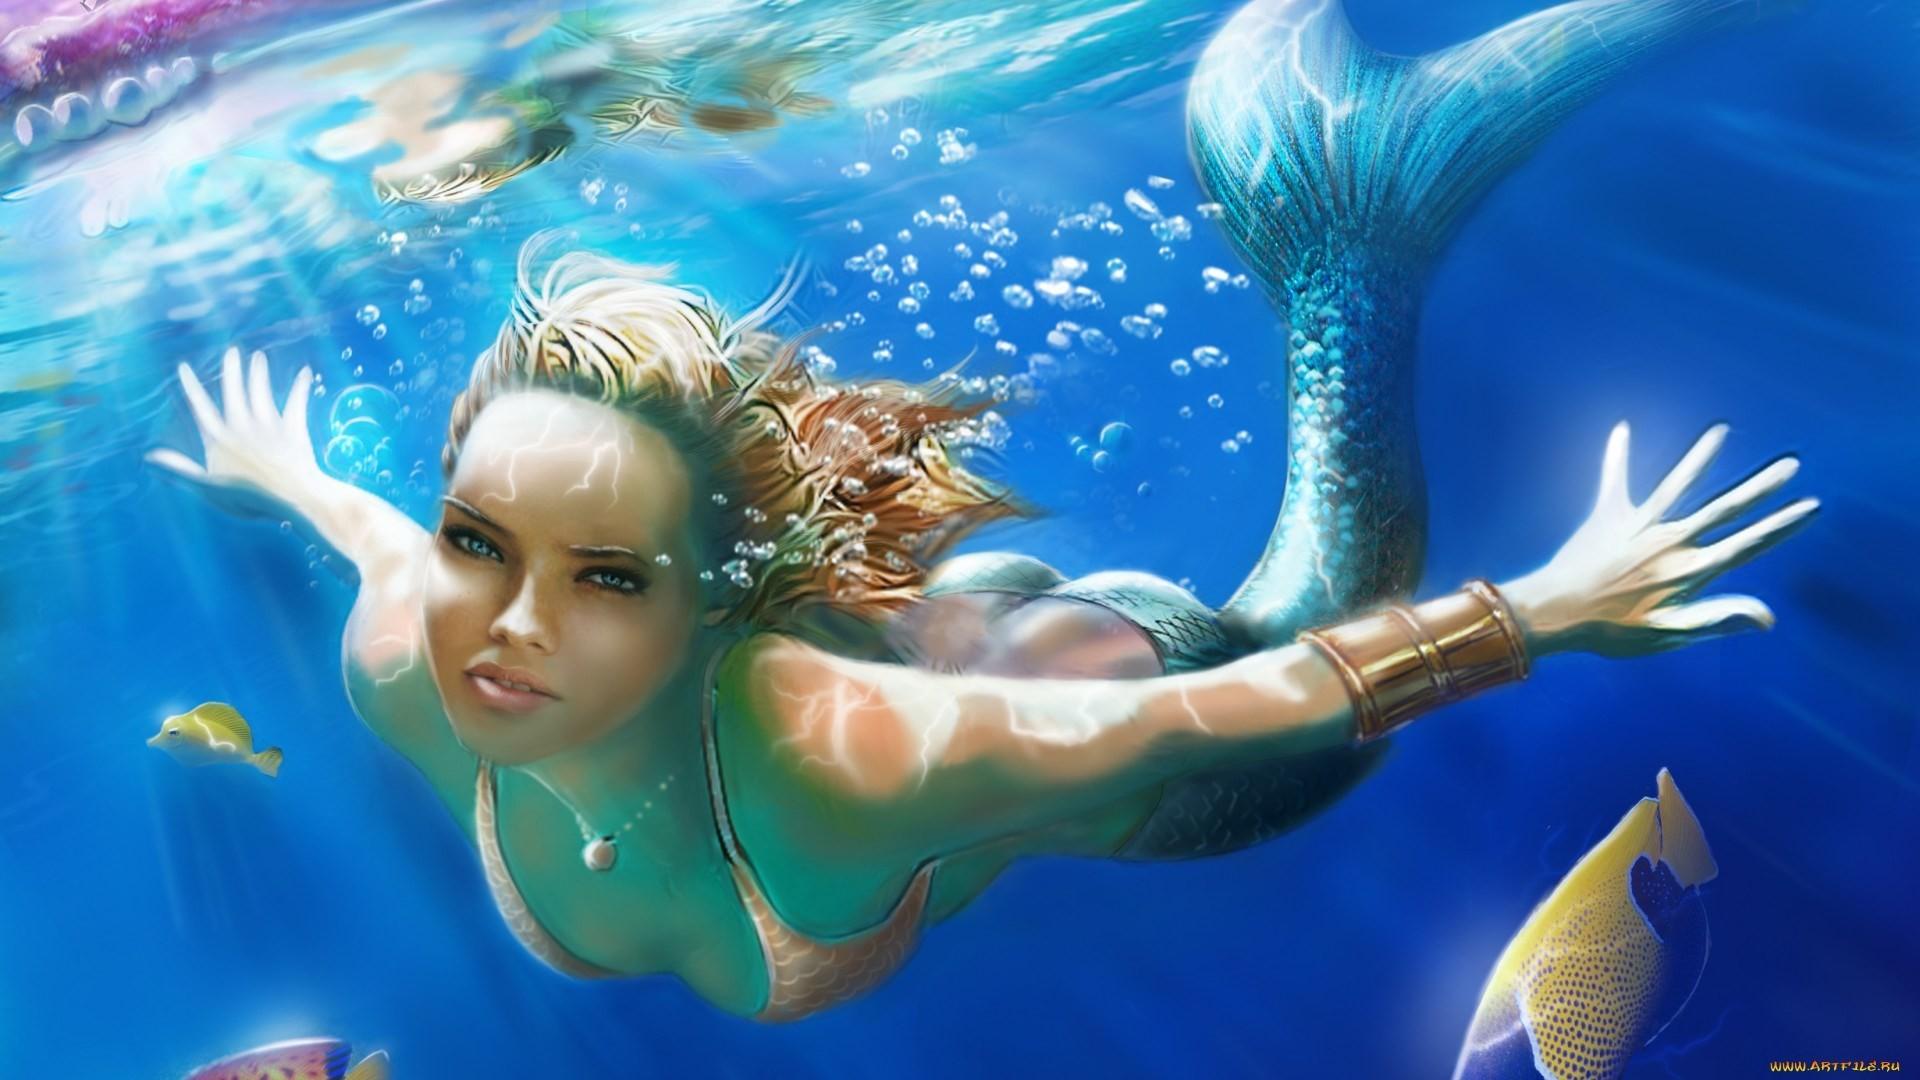 mermaid wallpaper free hd widescreen – mermaid category